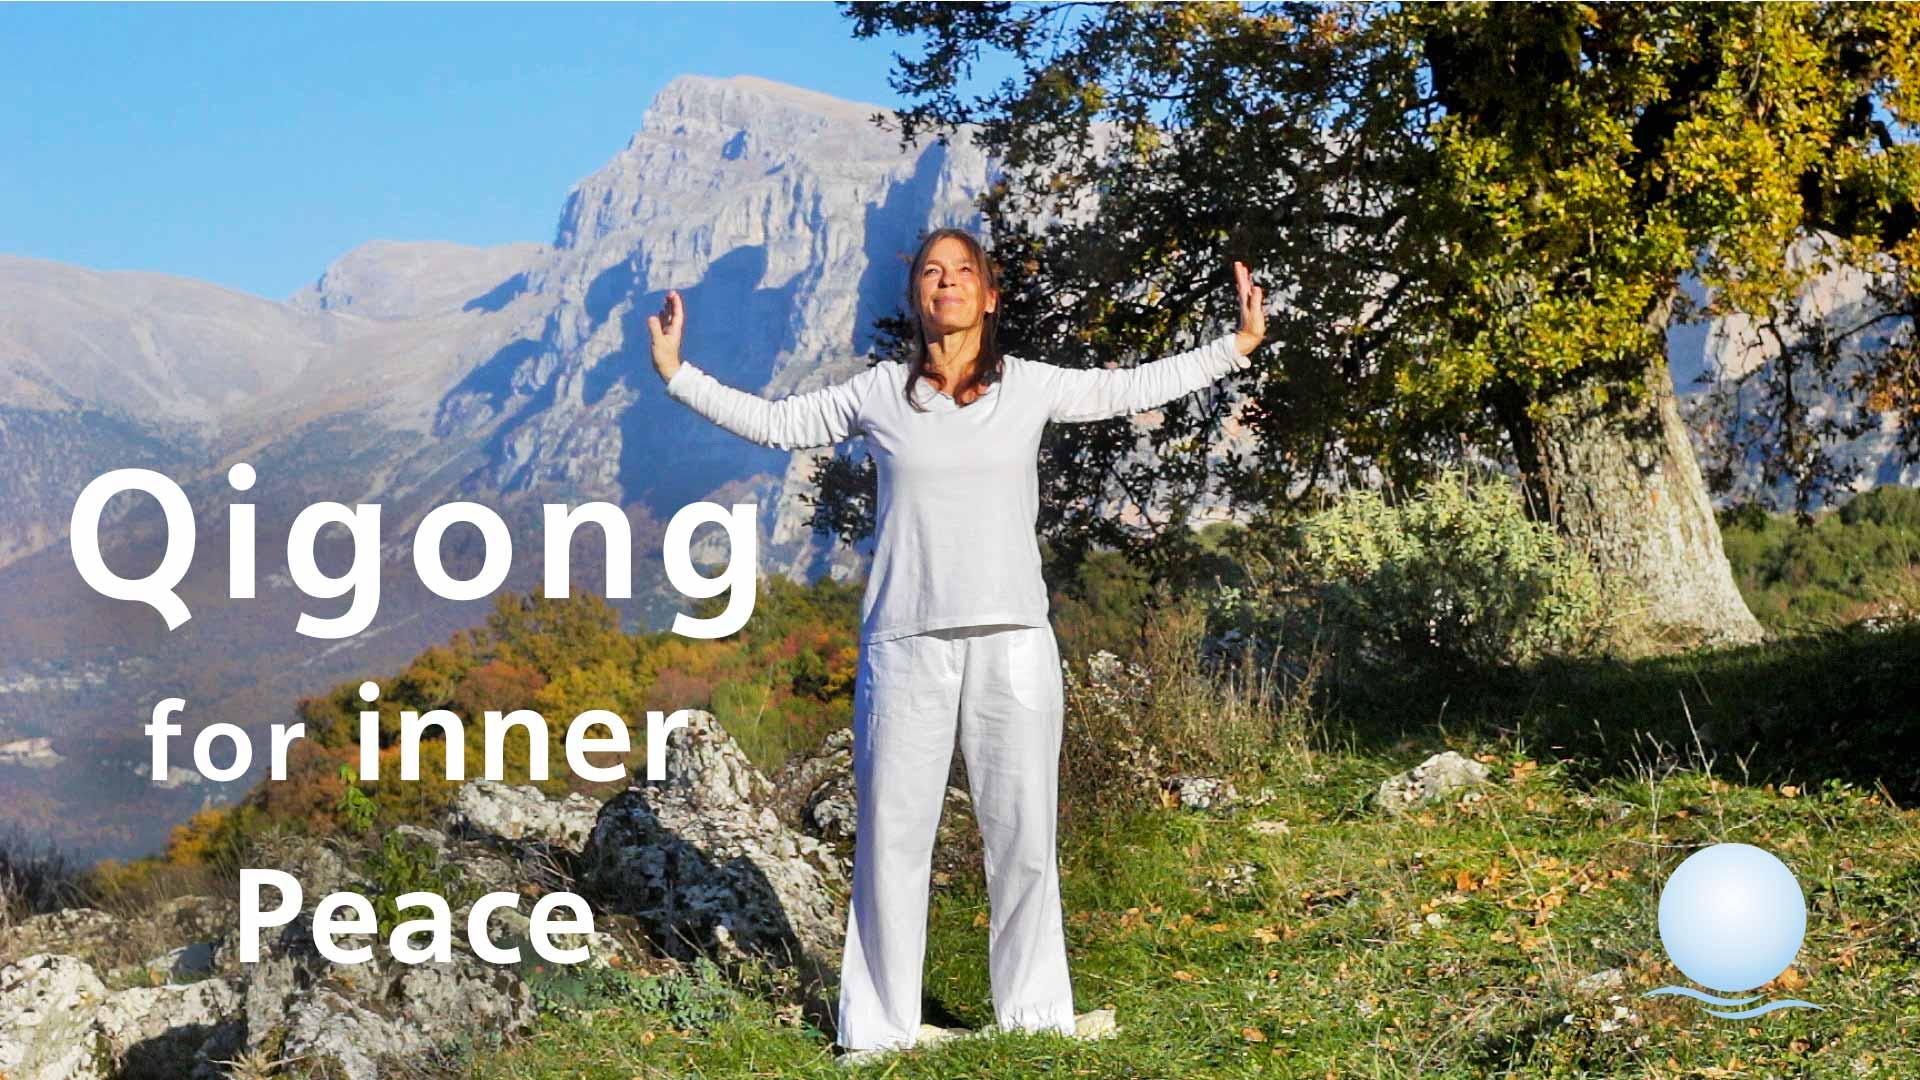 Qigong for inner peace